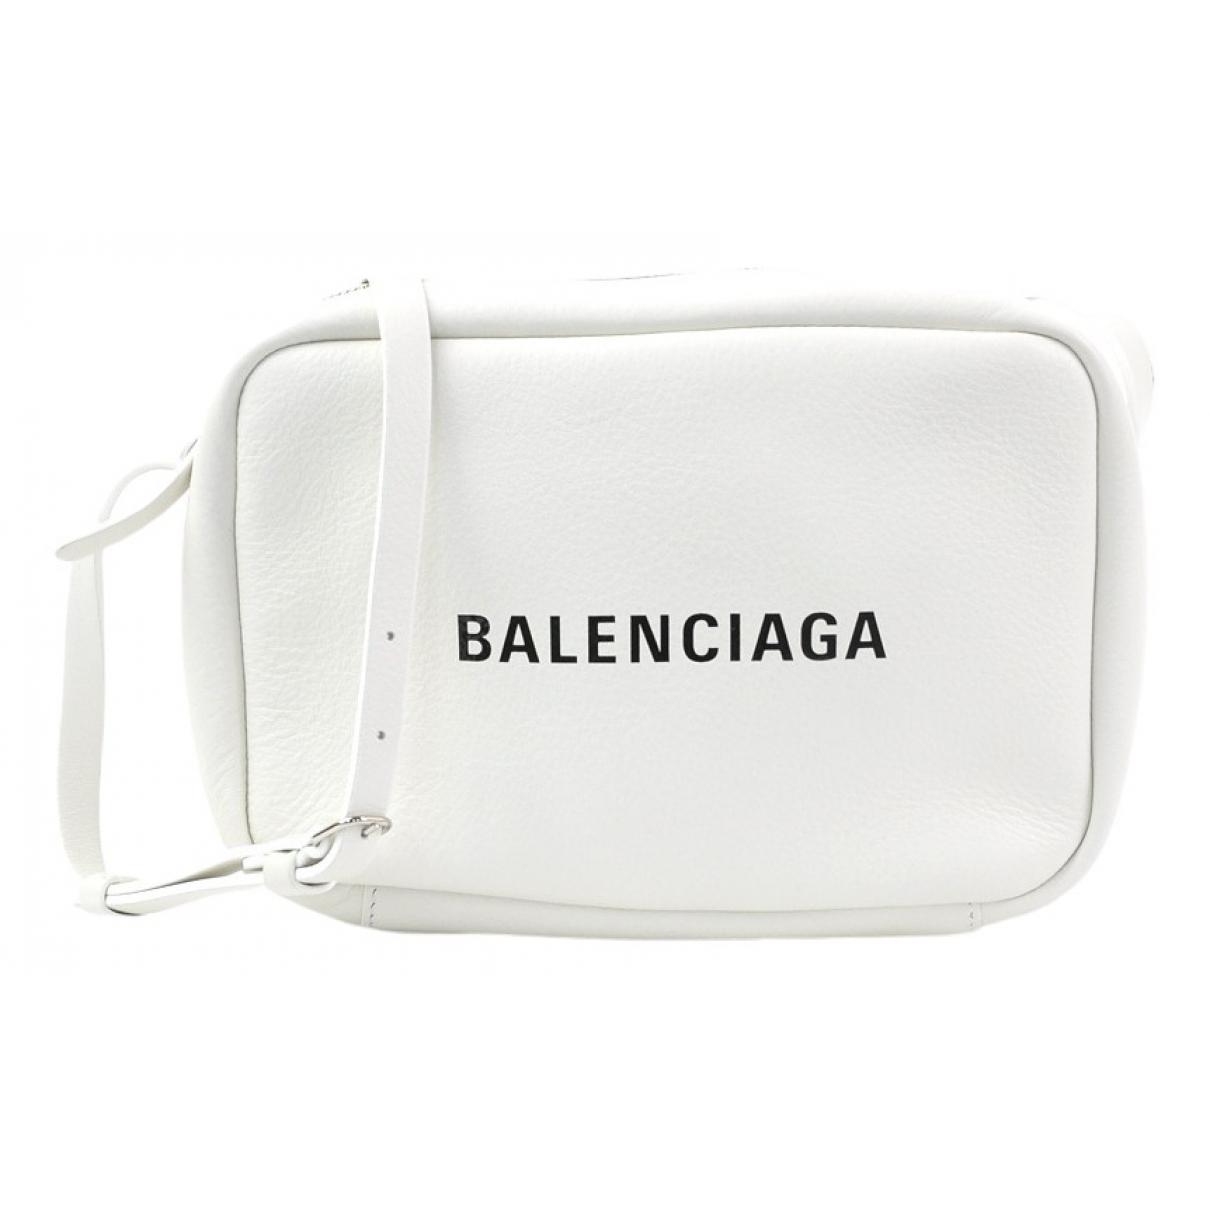 Balenciaga Camera Handtasche in  Weiss Leder